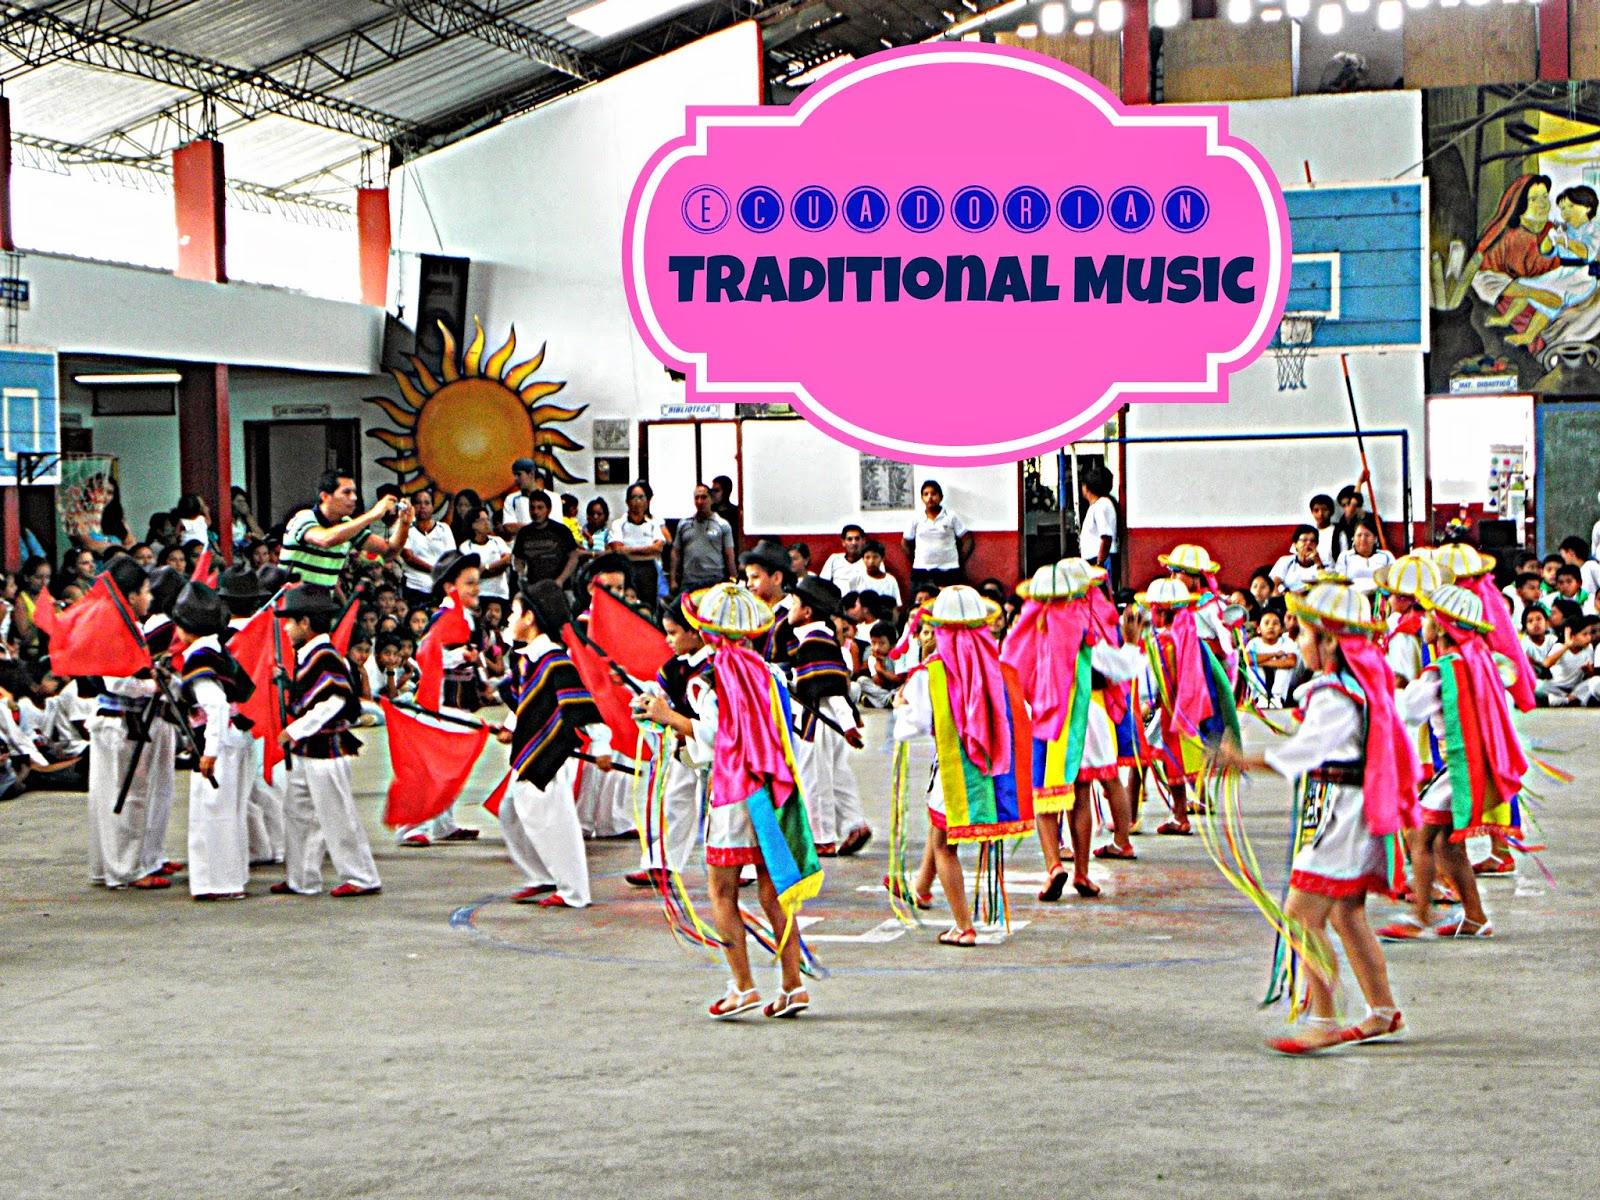 ecuadorian culture - photo #34